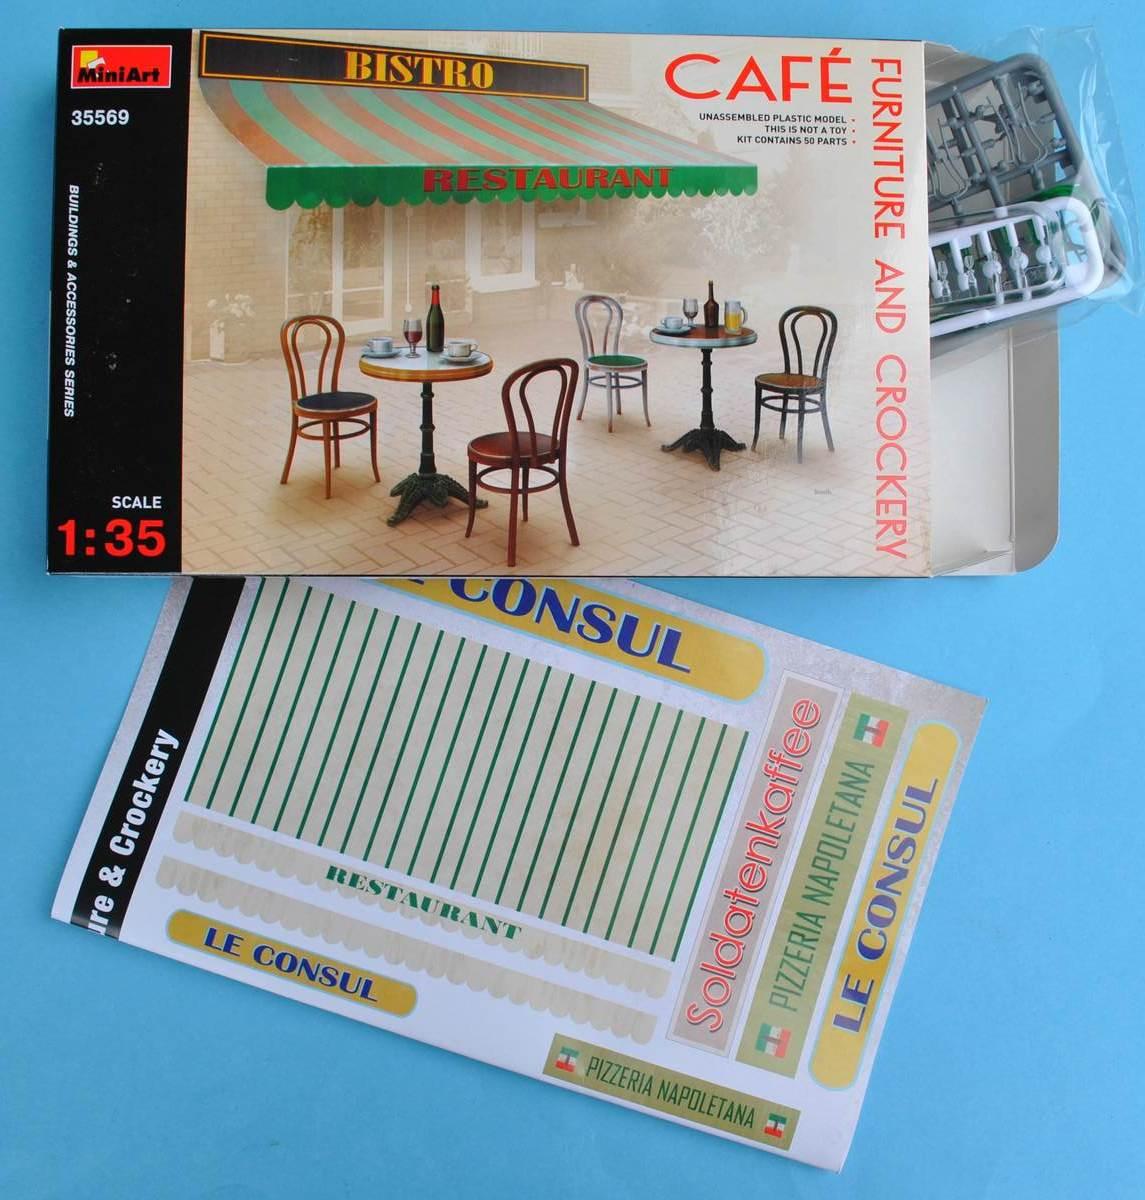 MiniArt-35569-Cafe-Furniture-and-Crockery-11 Café Furniture and crockery von MiniArt in 1:35 ( # 35569 )